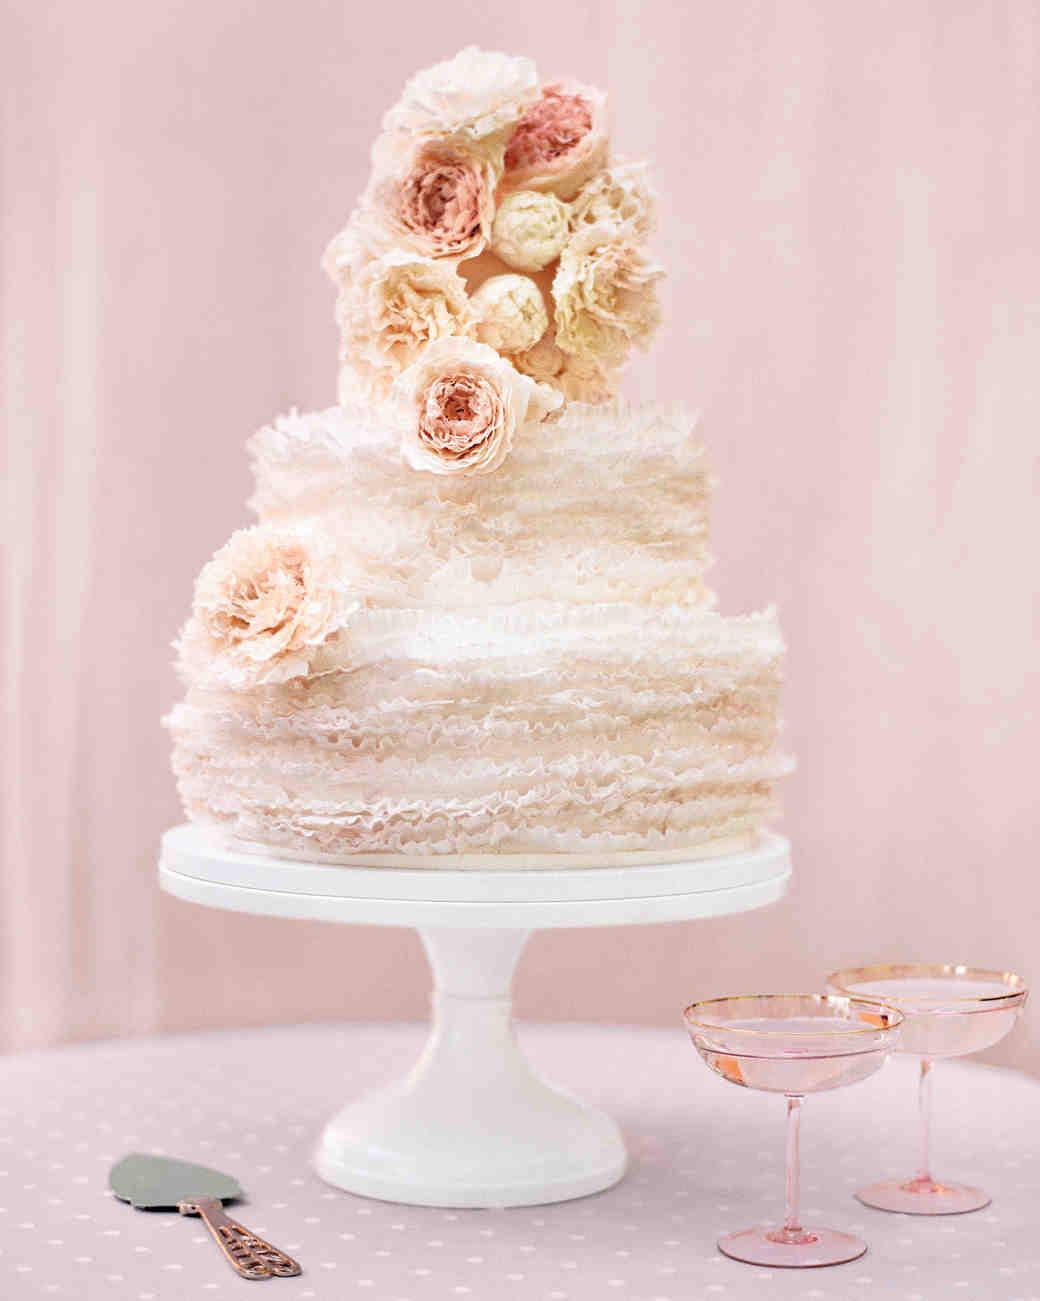 joanna-kyle-real-weddings-wedding-cake-009037-r1-016-d111223.jpg